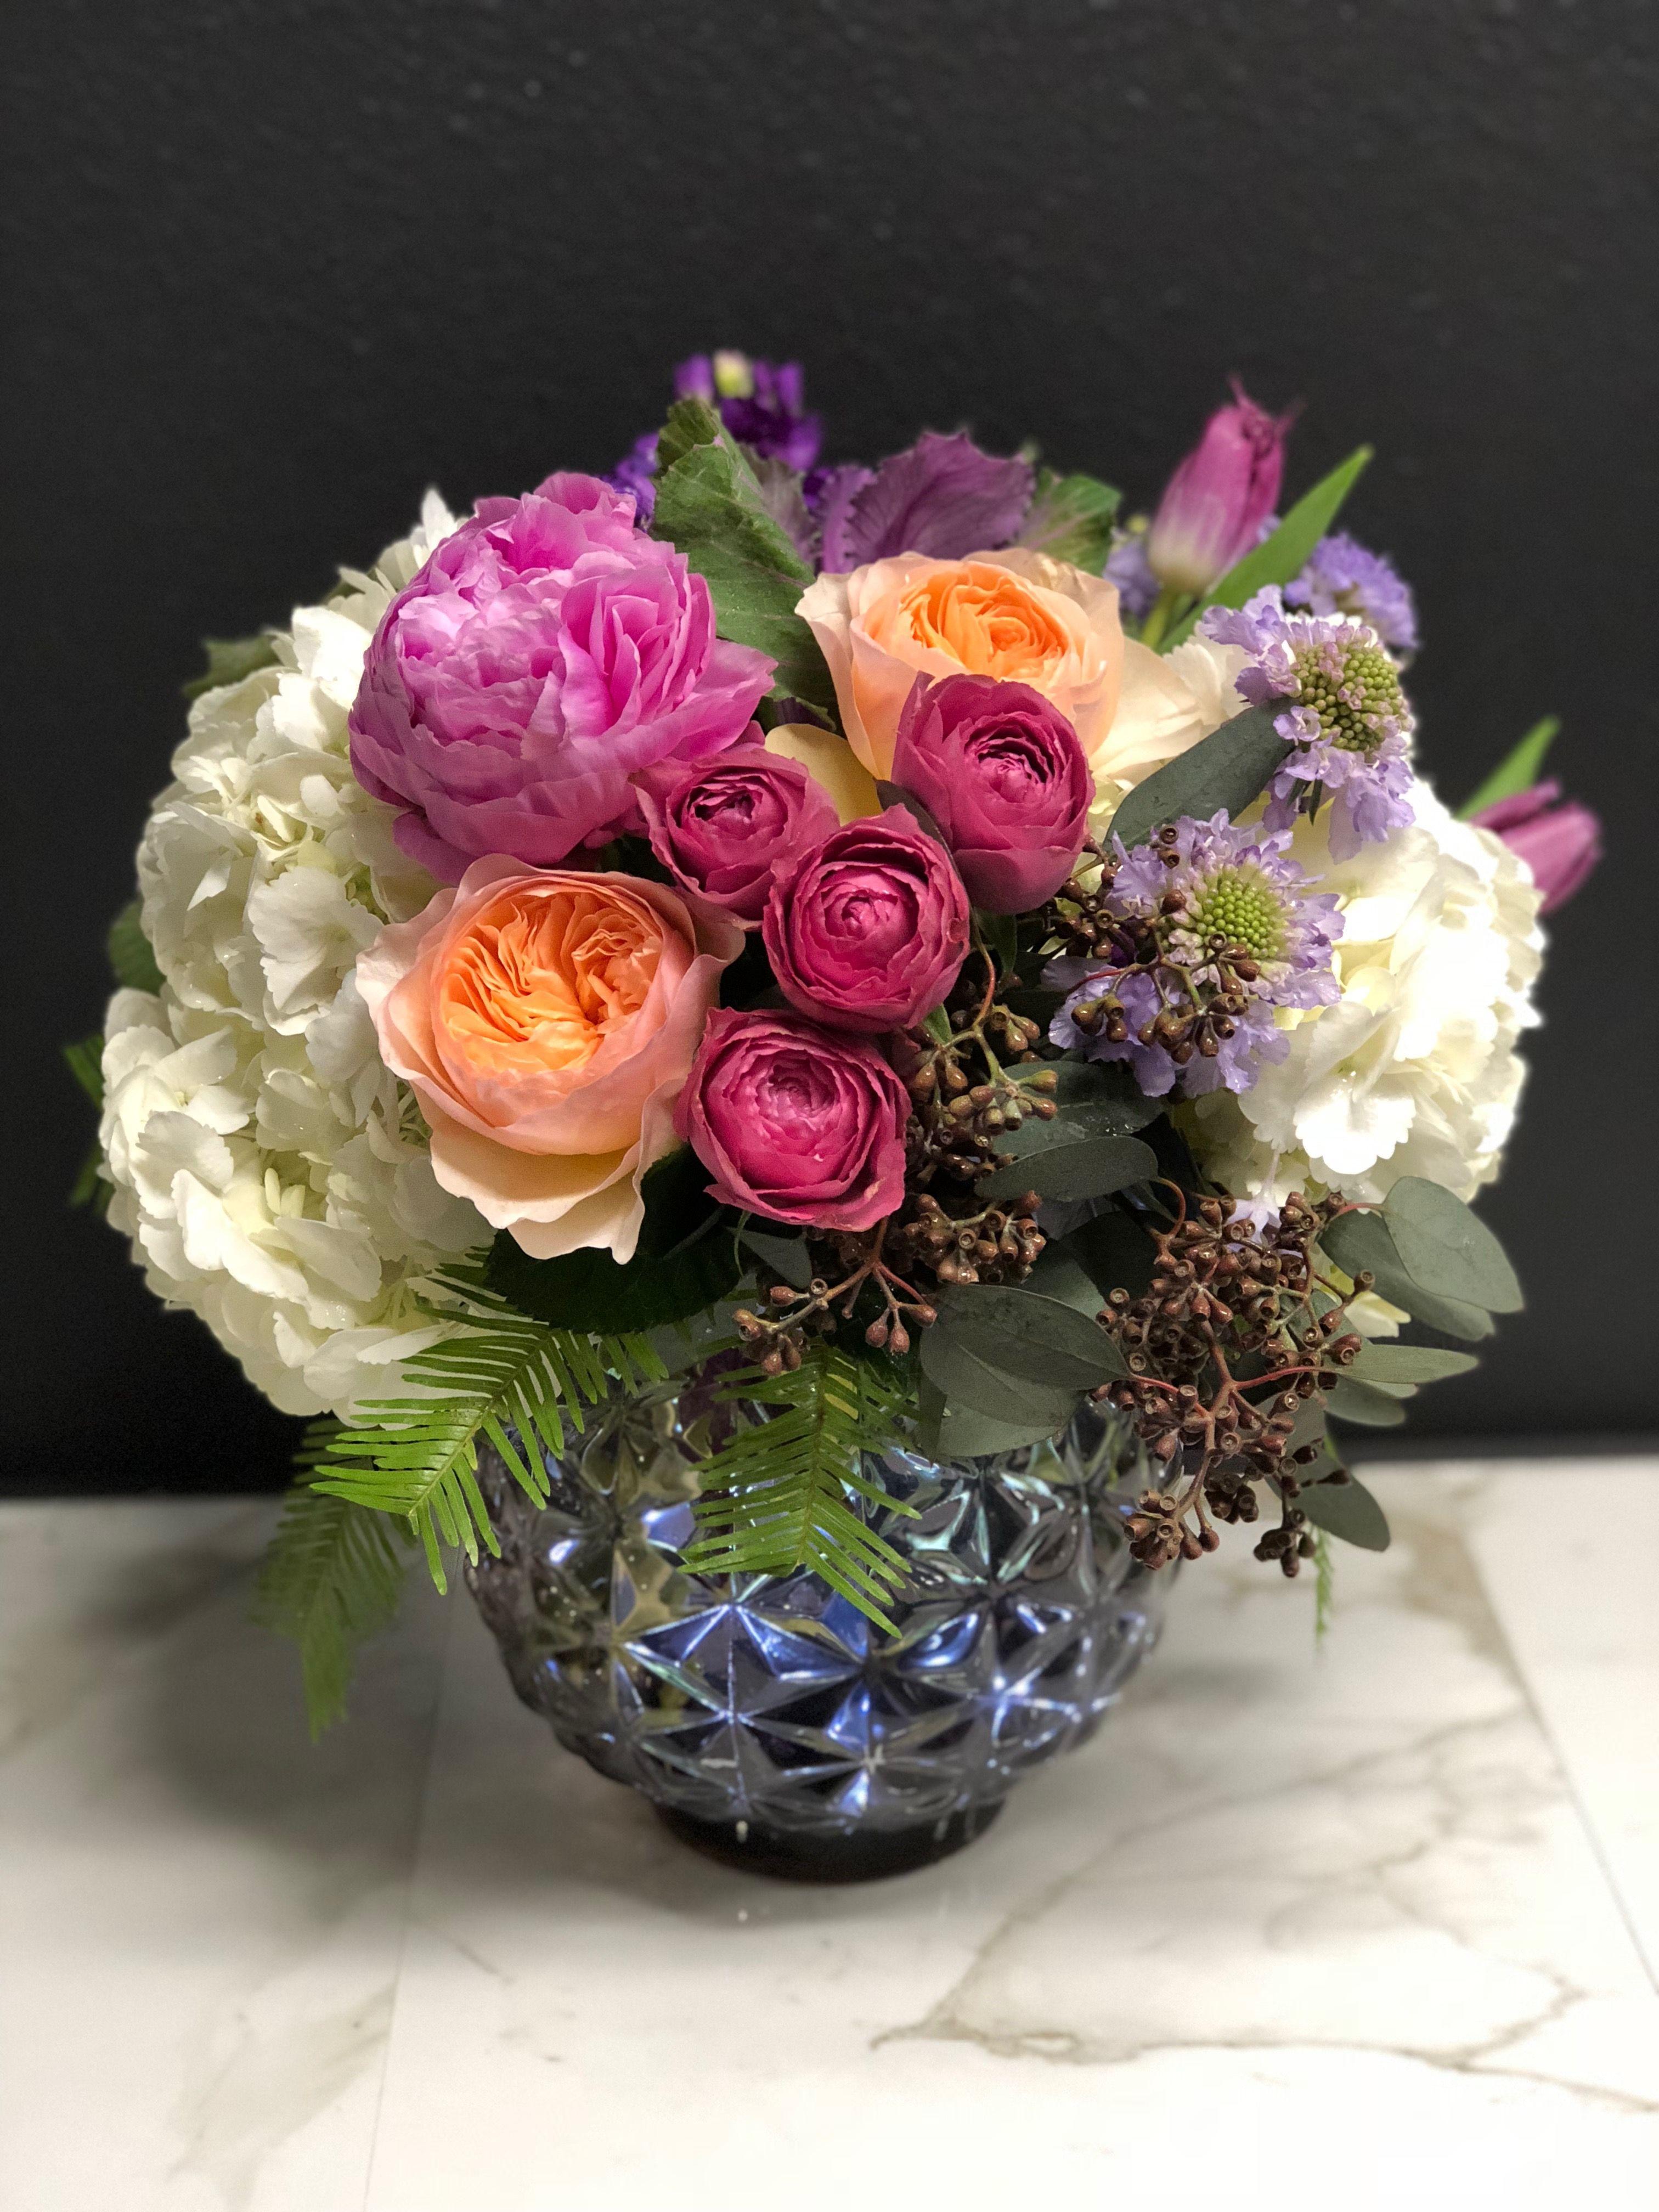 A lovely arrangement of Garden Roses, Peonies, Hydrangea